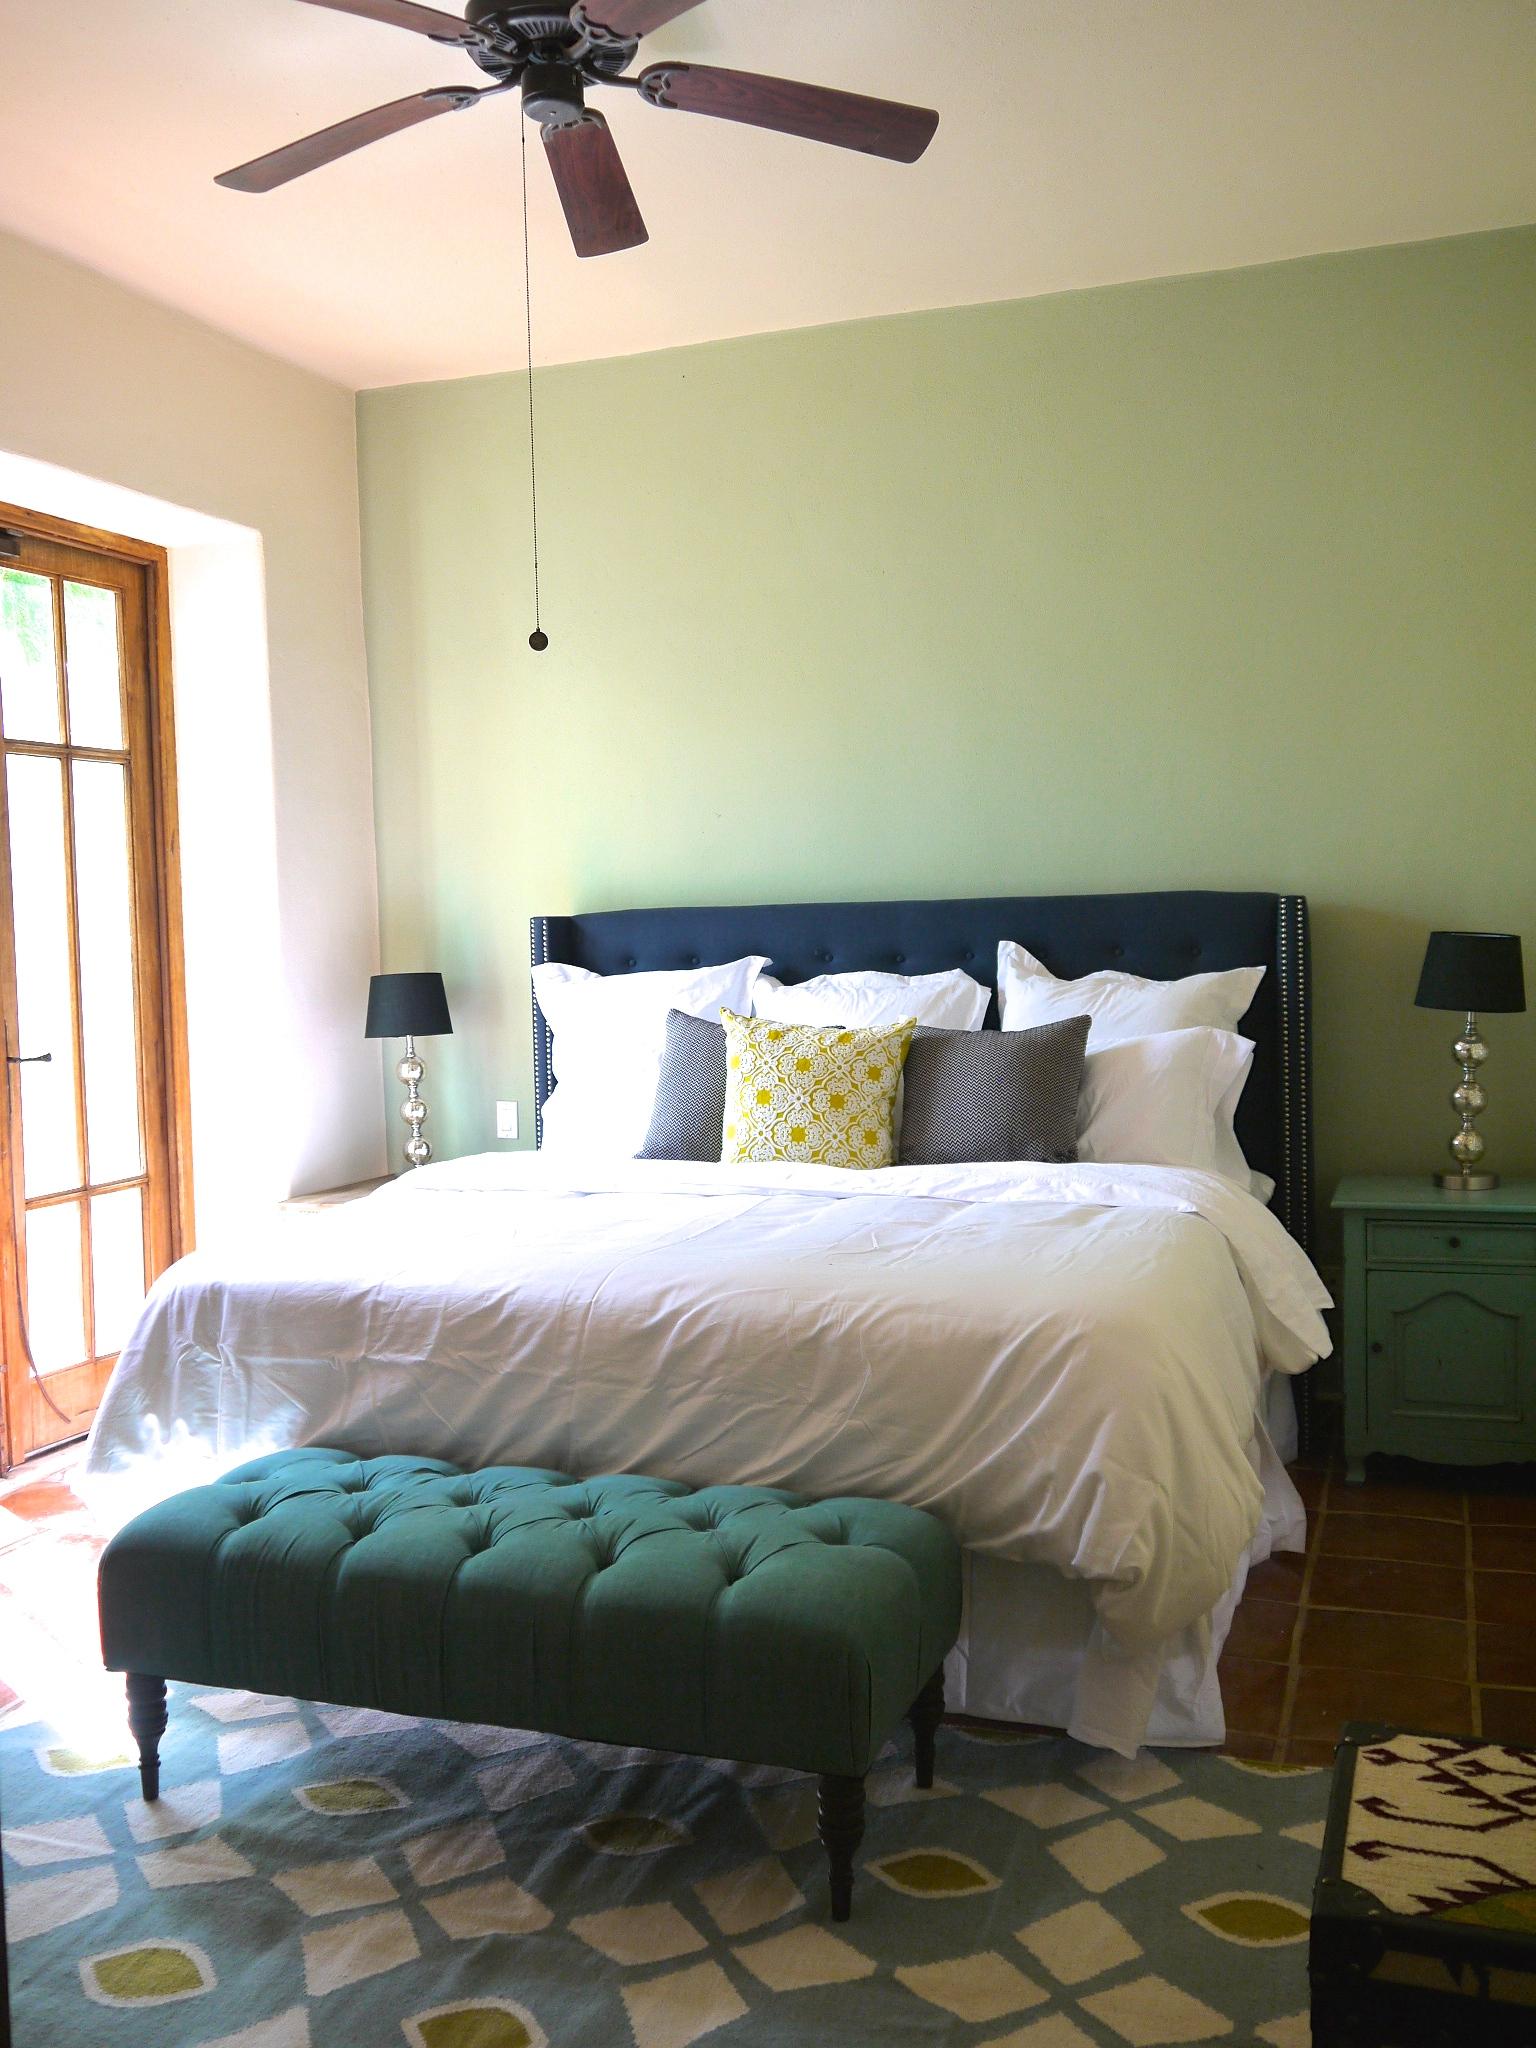 Ground floor master suite with private garden courtyard